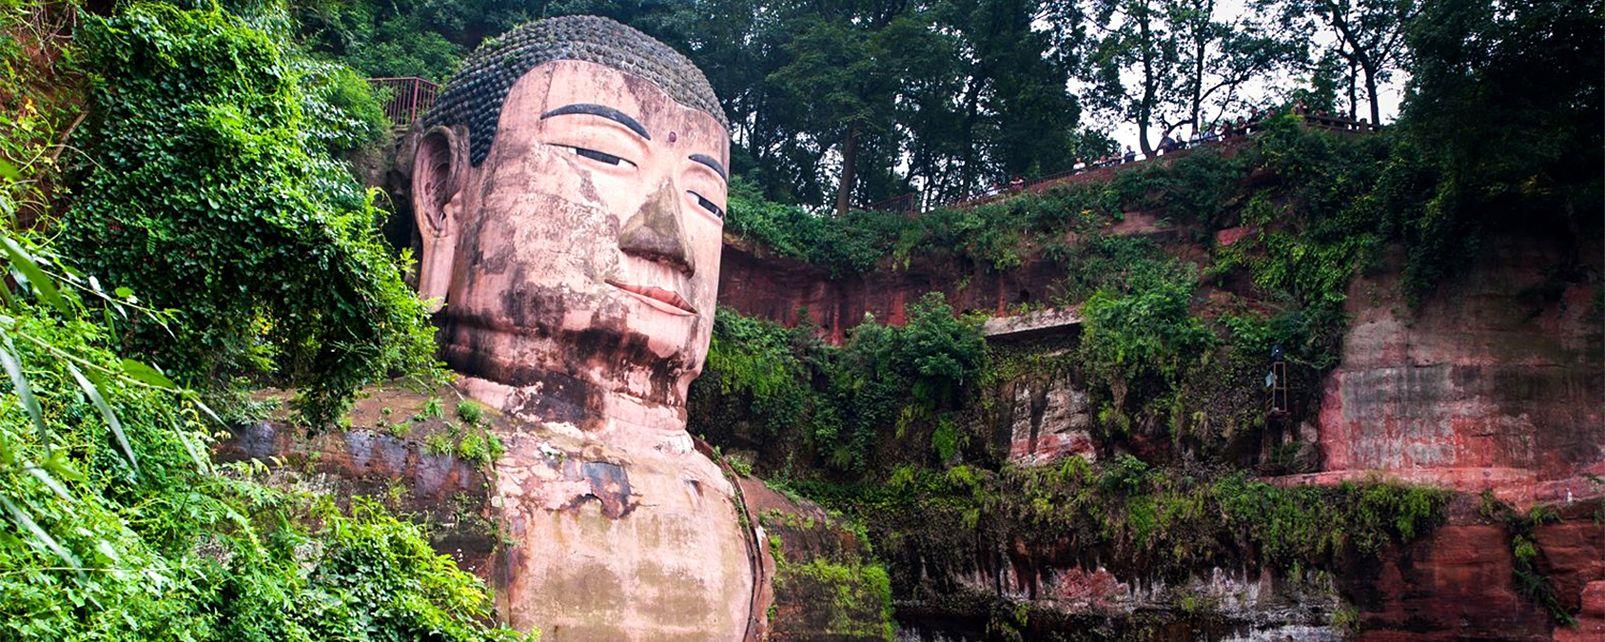 El Gran Buda de Leshan , China